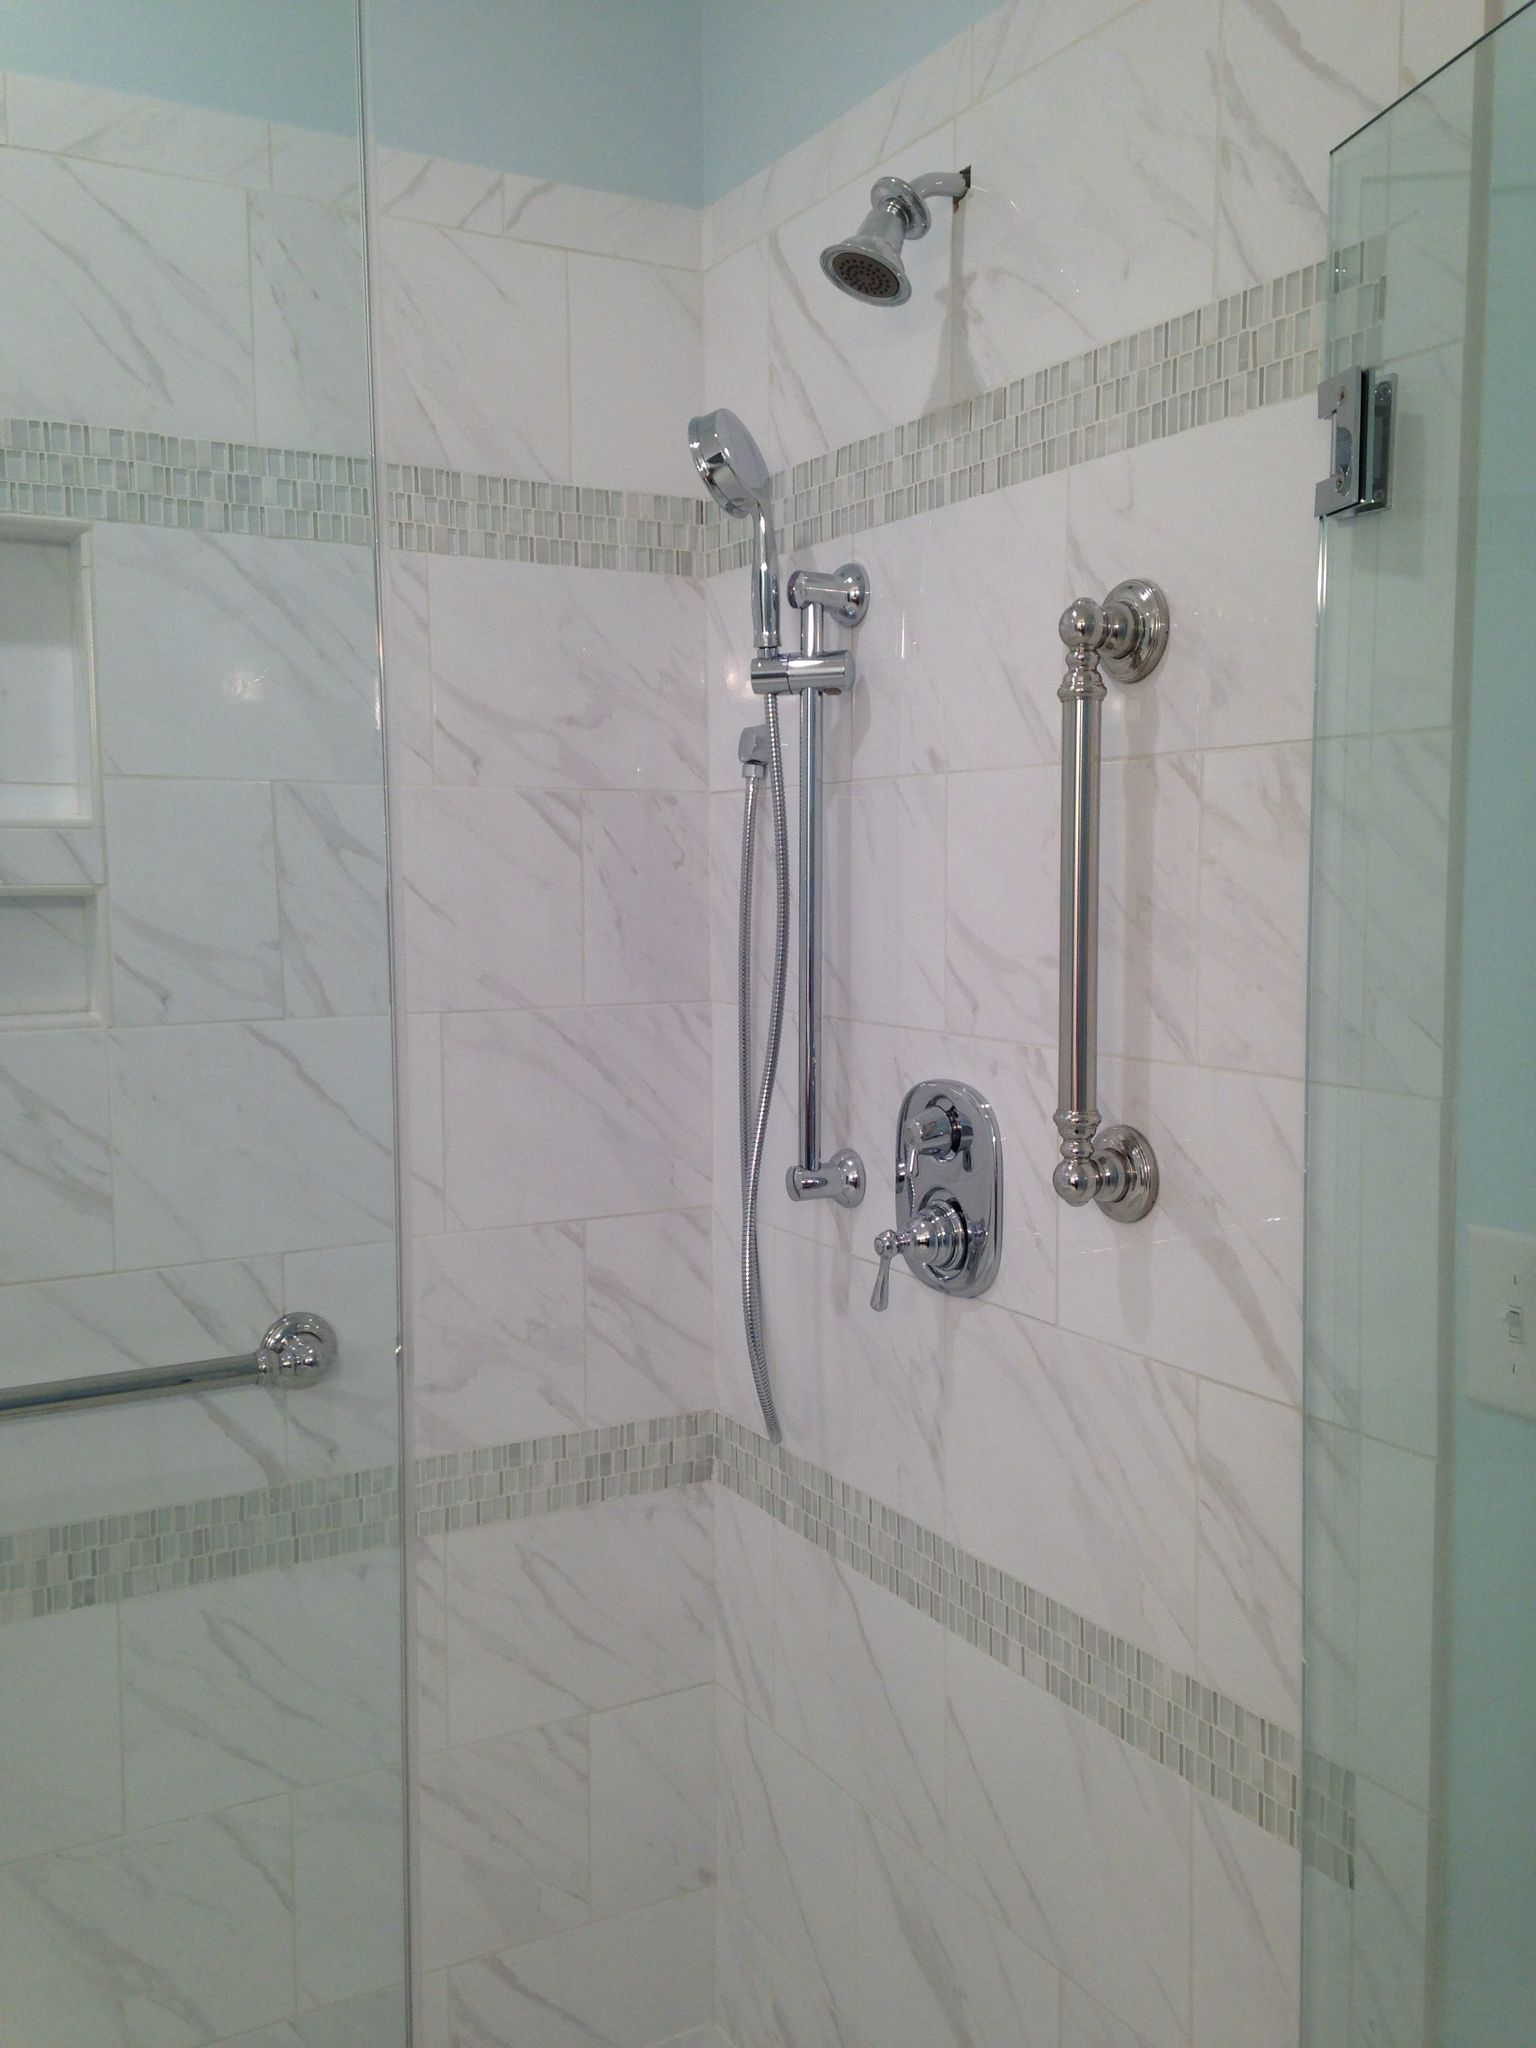 Daltile florentine fl06 carrara 10x14 with glass accent for Daltile bathroom ideas